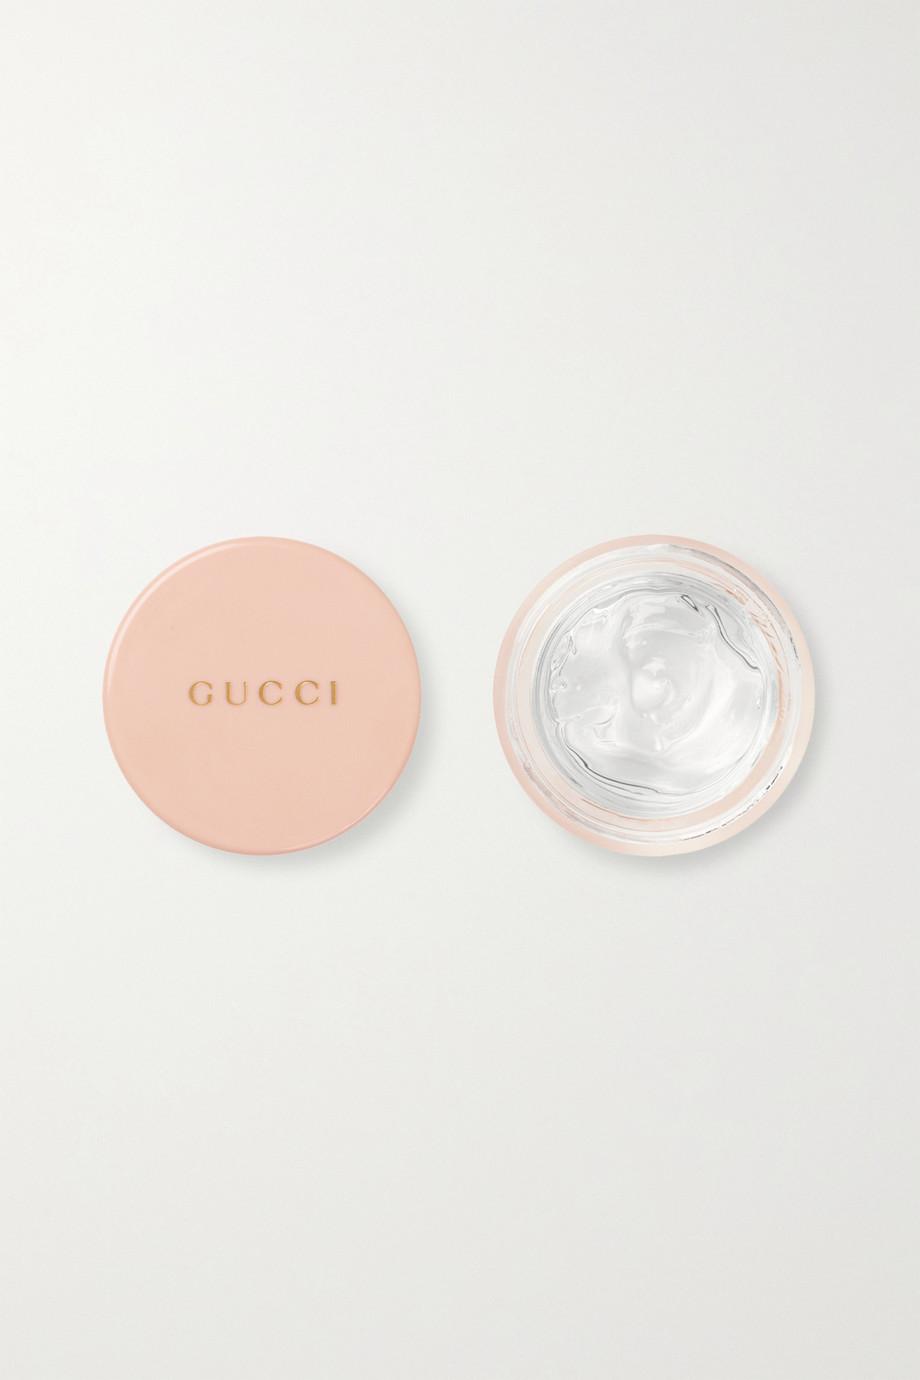 Gucci Beauty Éclat De Beauté Effet Lumière Gel Face Gloss, 6ml